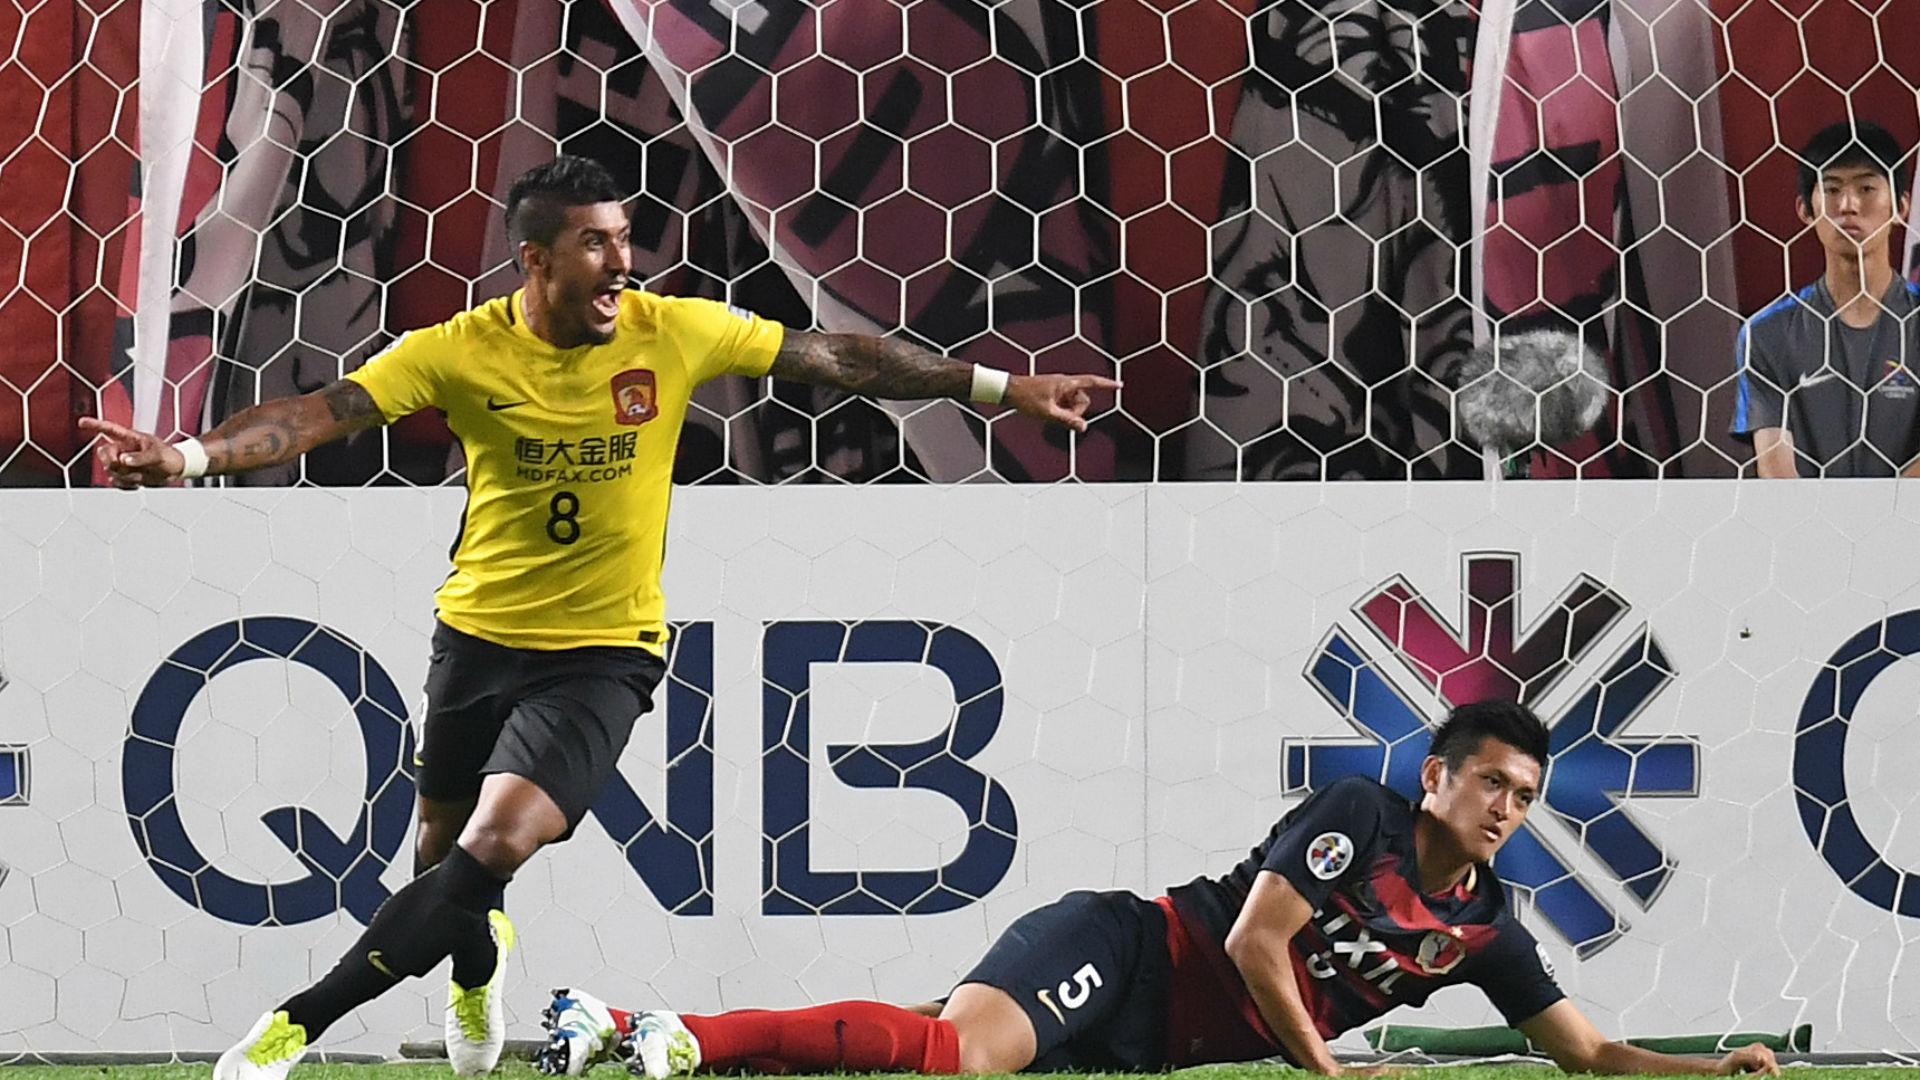 Paulinho en la mira: Barcelona ya conversa con Guangzhou Evergrande